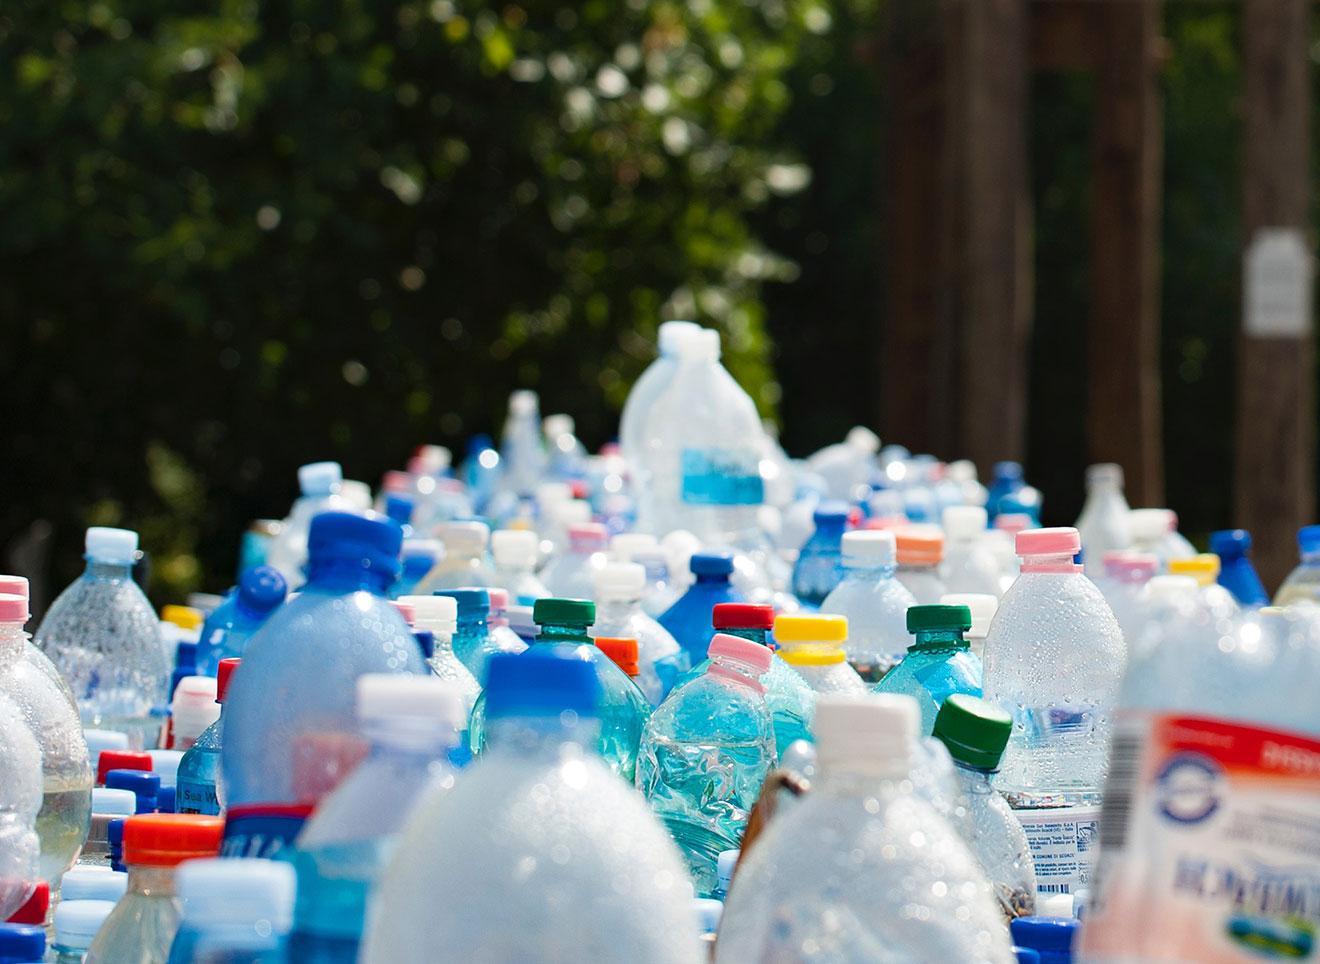 waste-management-services